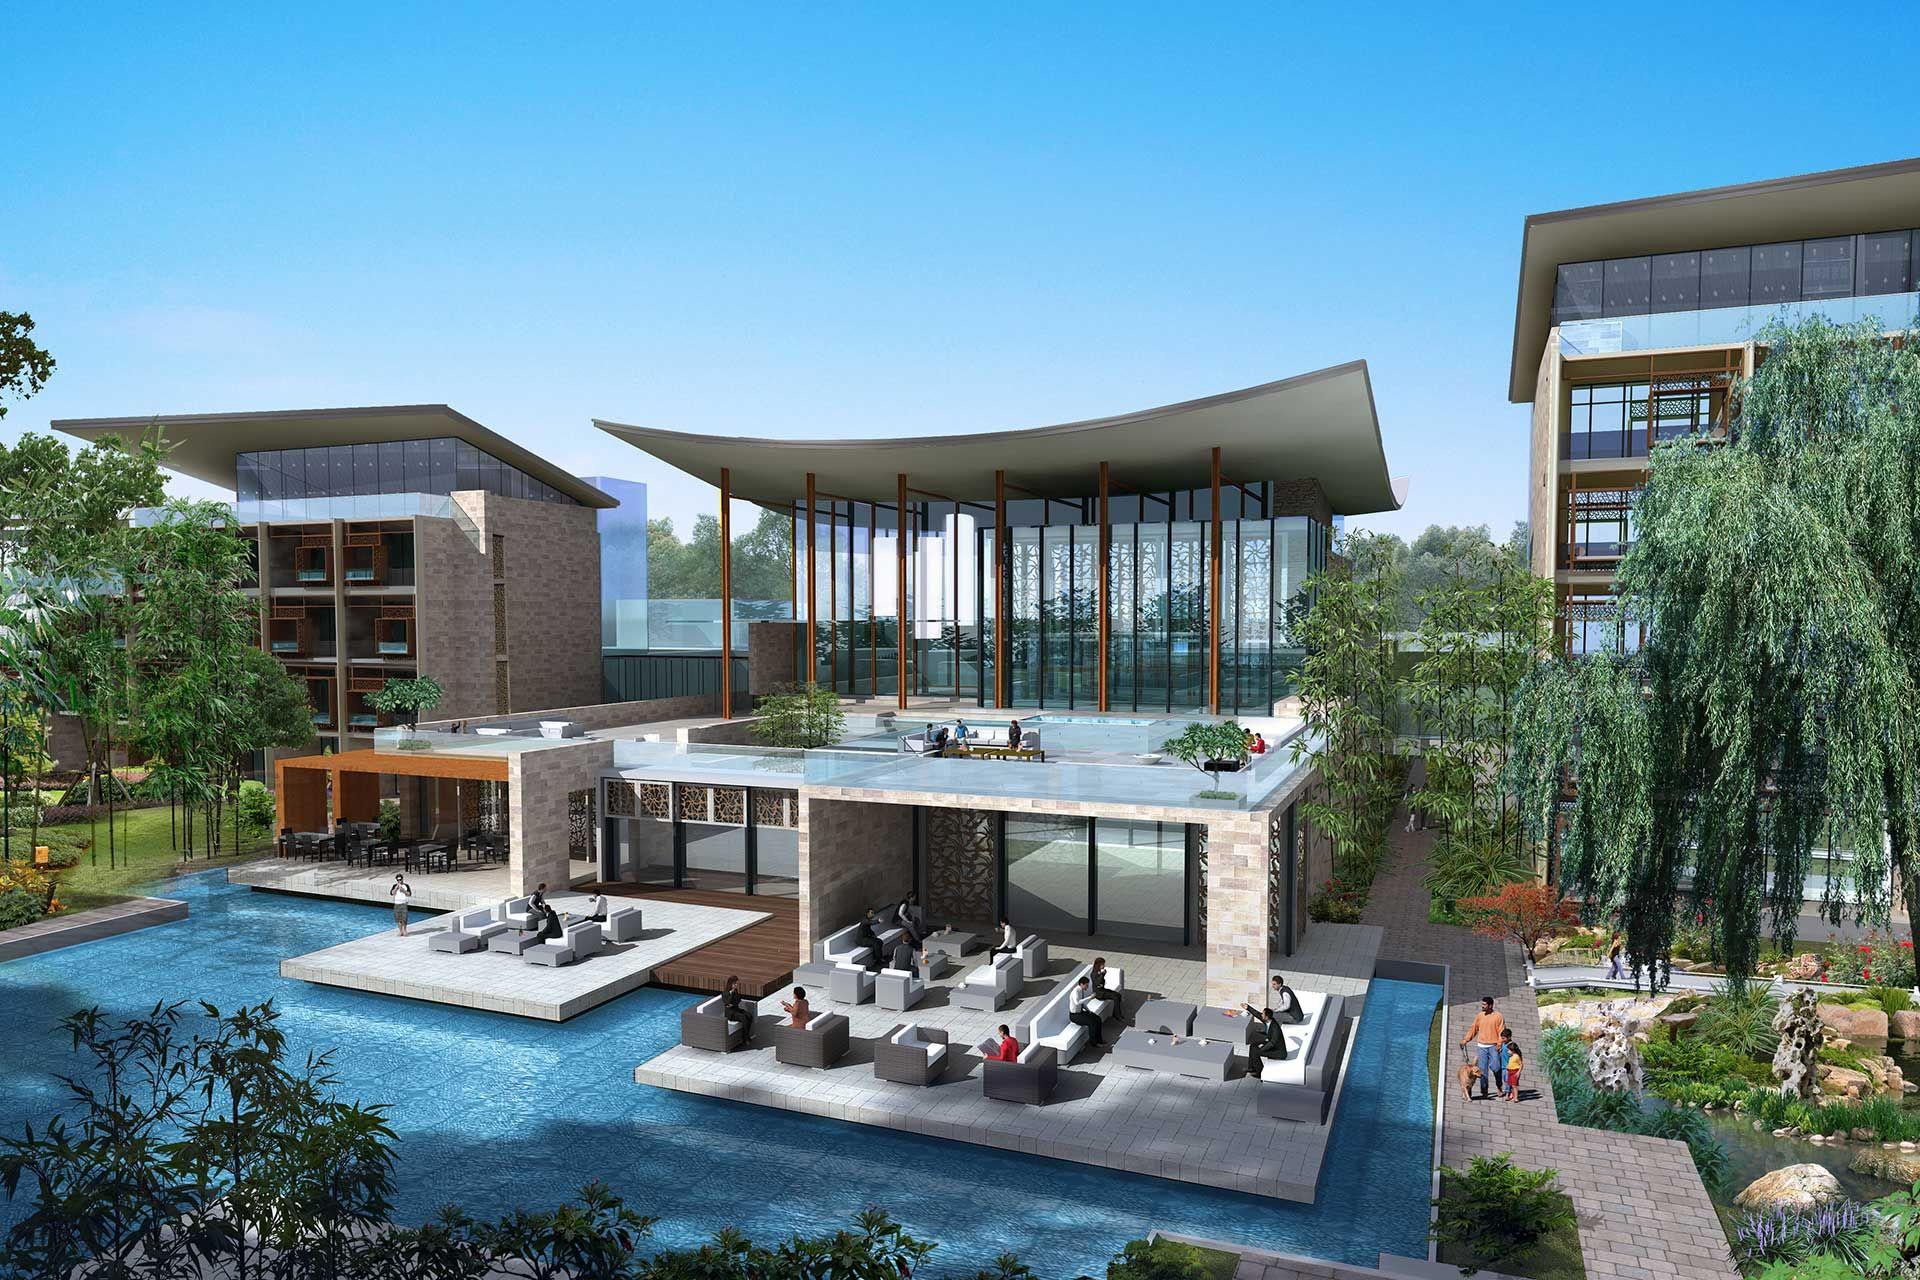 Four Seasons Resort Suzhou Architects Hotel Facade Architect Resort [ 1280 x 1920 Pixel ]